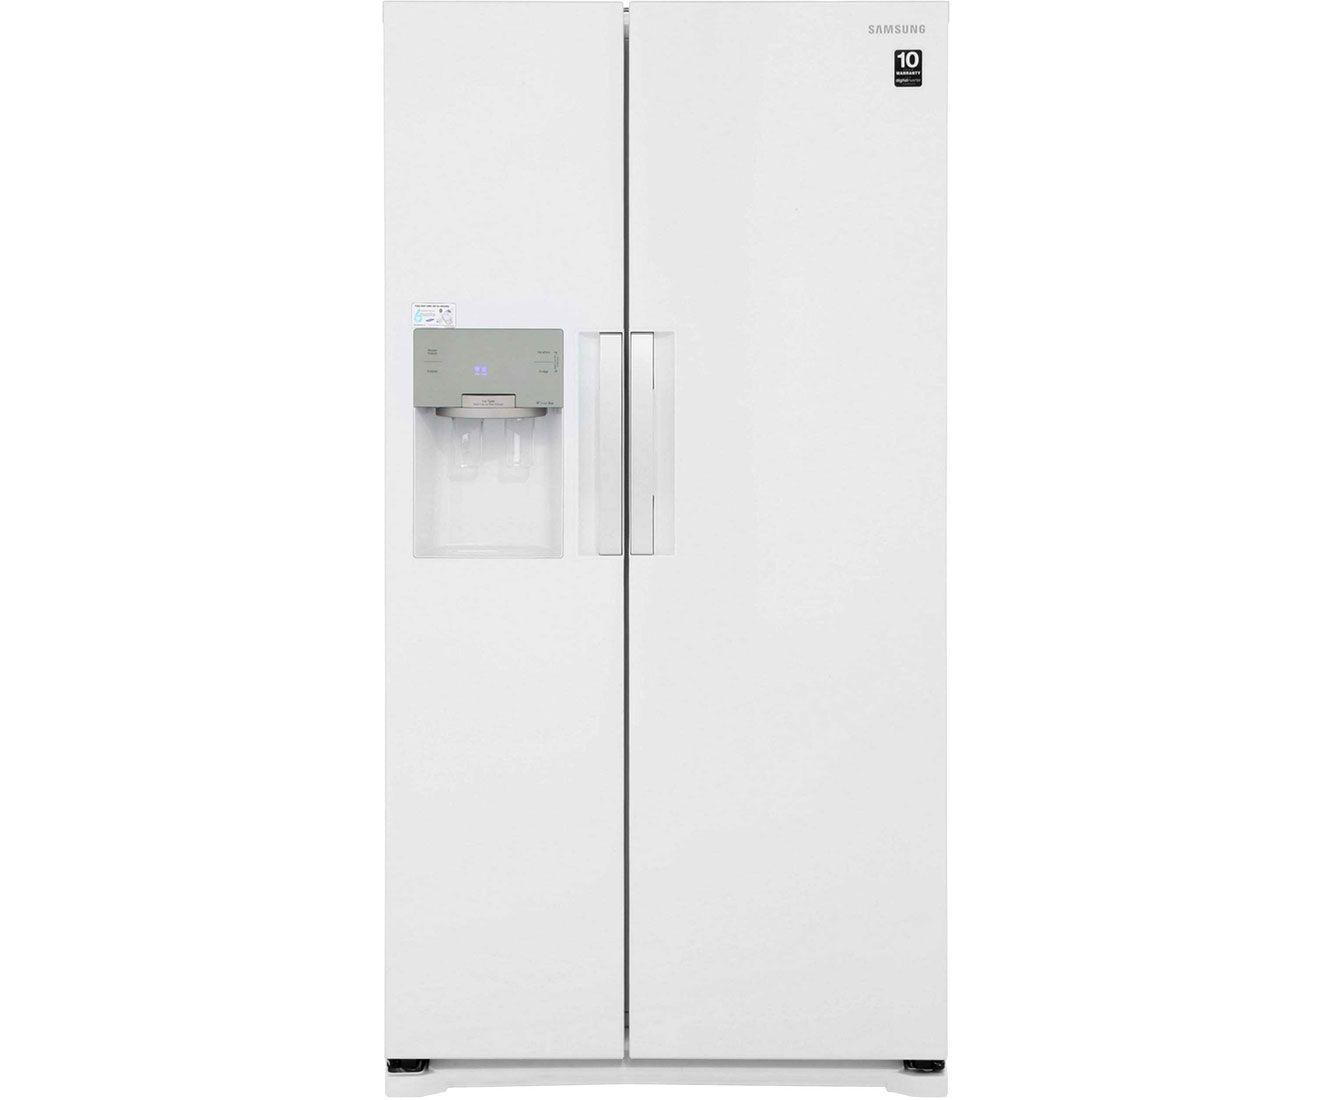 Samsung H-Series RS7667FHCWW American Fridge Freezer - Gloss White